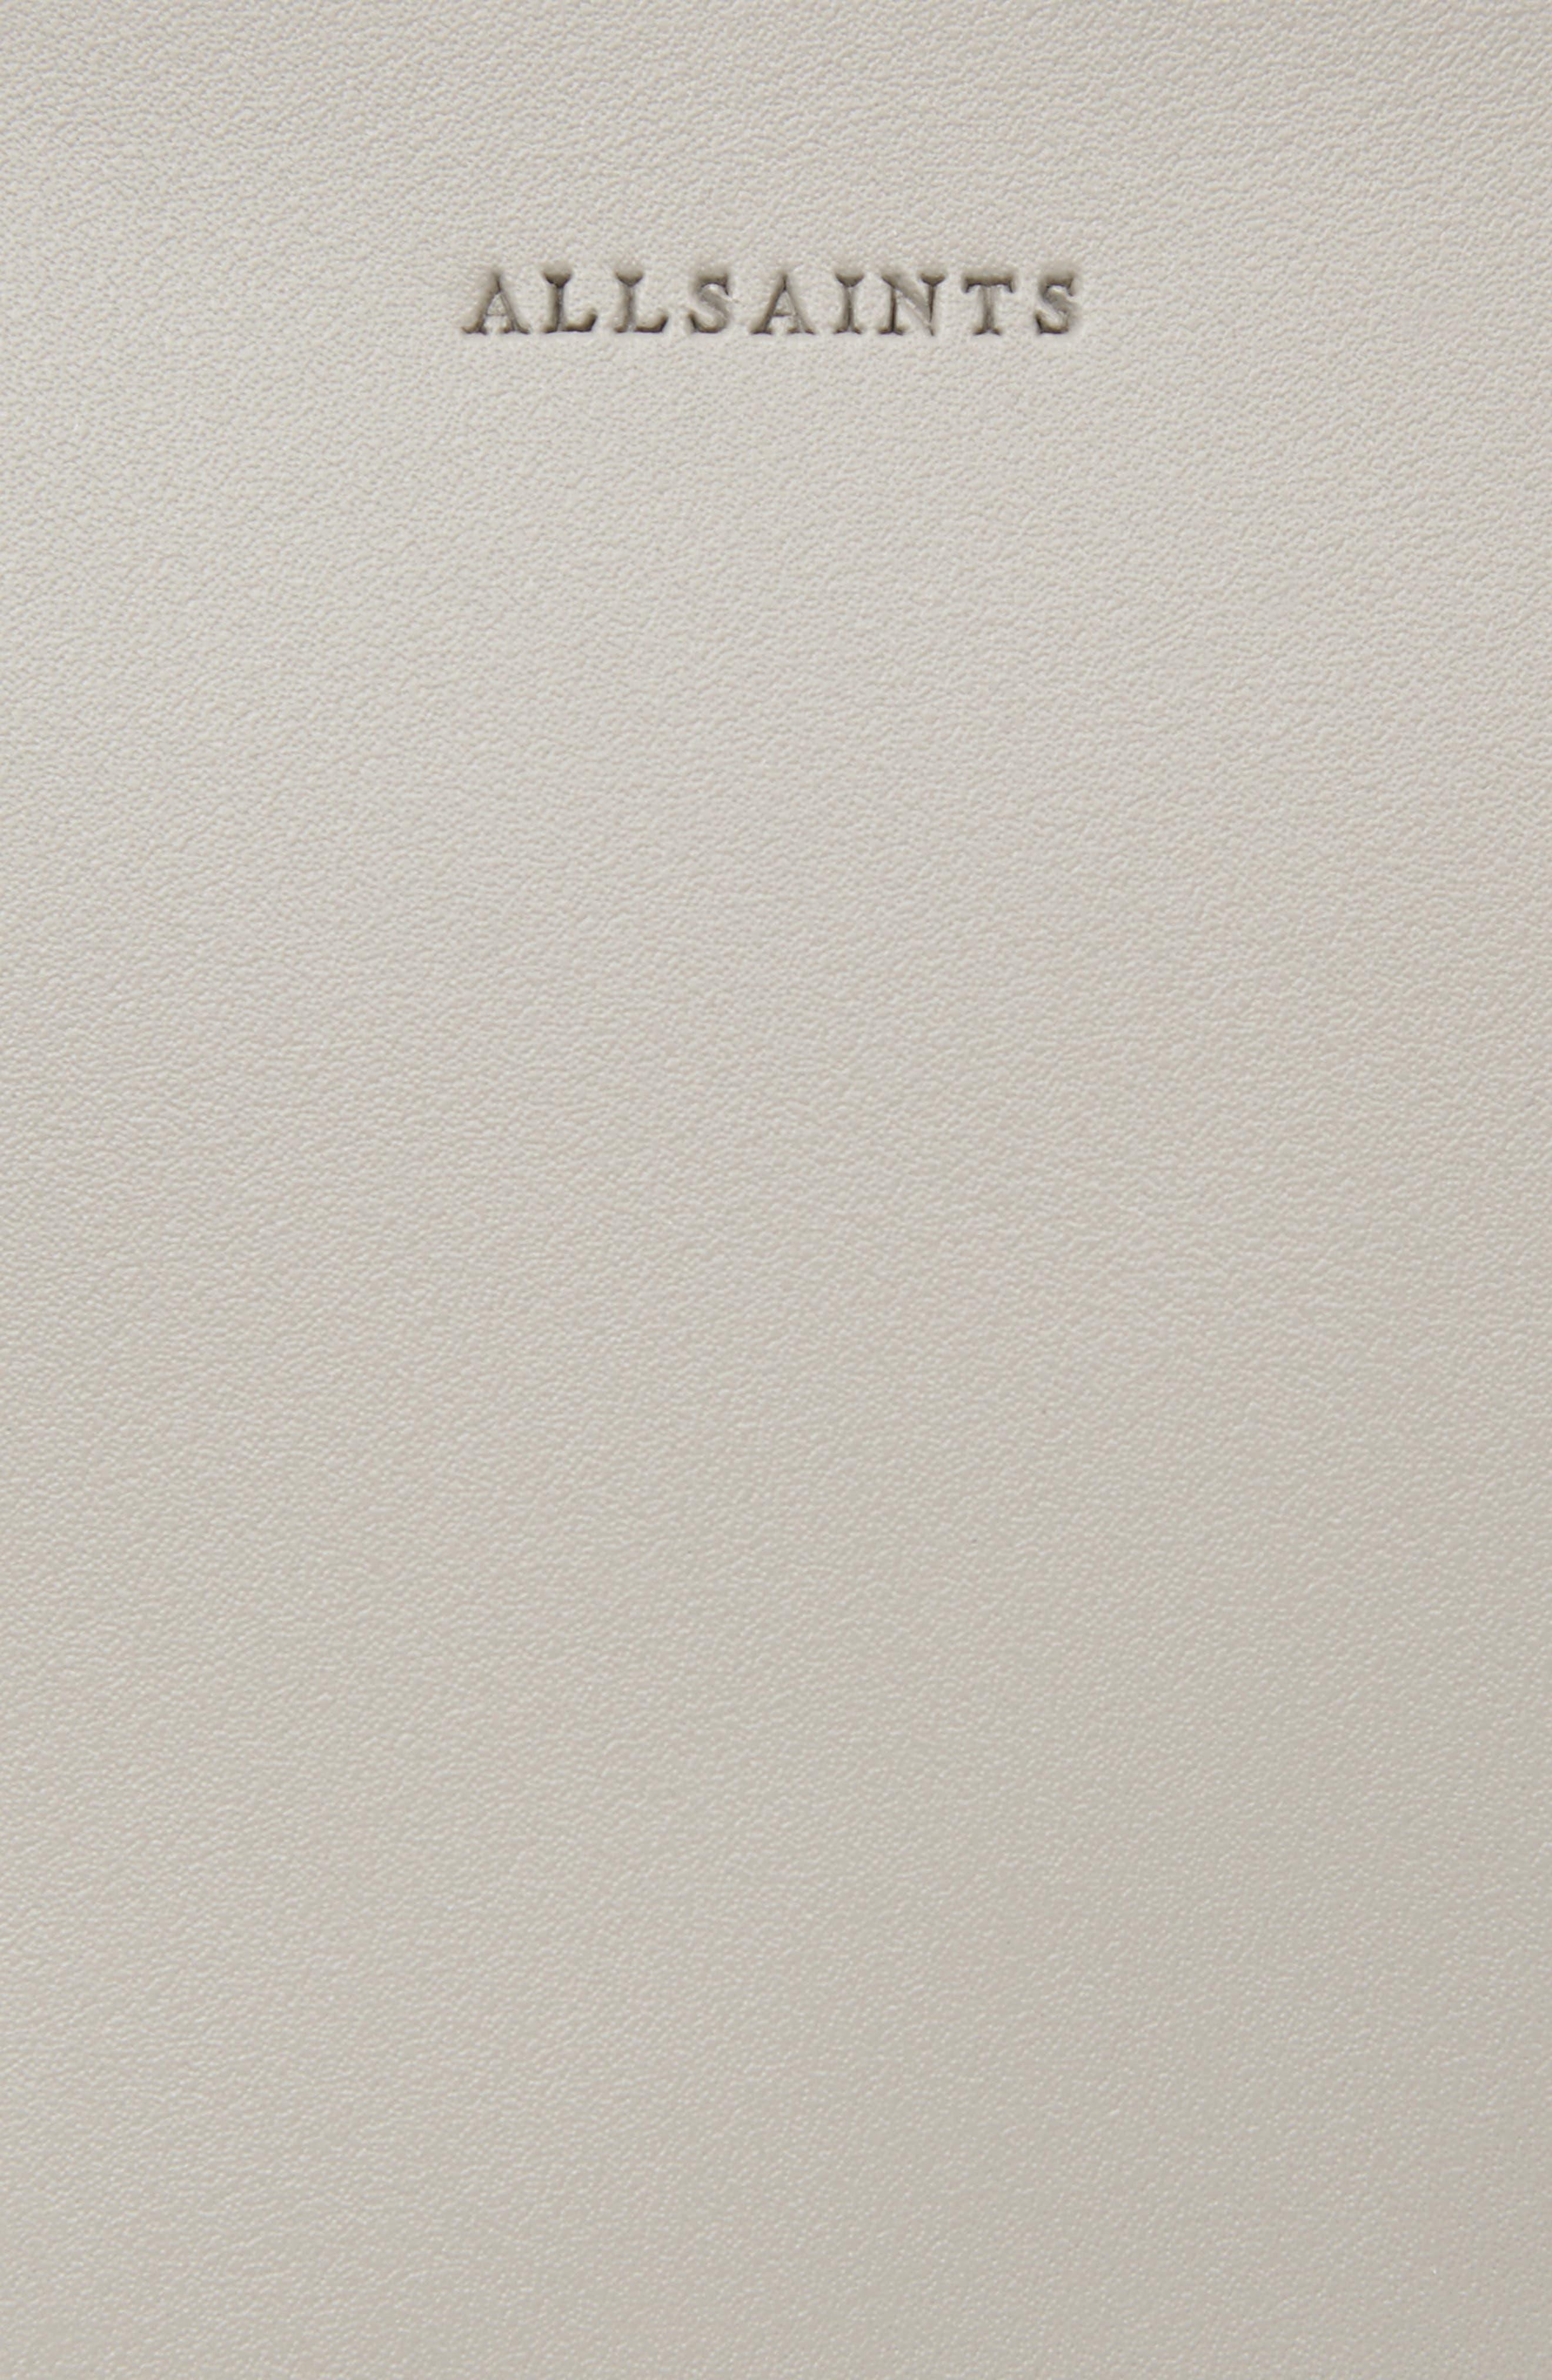 Kita Leather Shoulder/Crossbody Bag,                             Alternate thumbnail 4, color,                             052